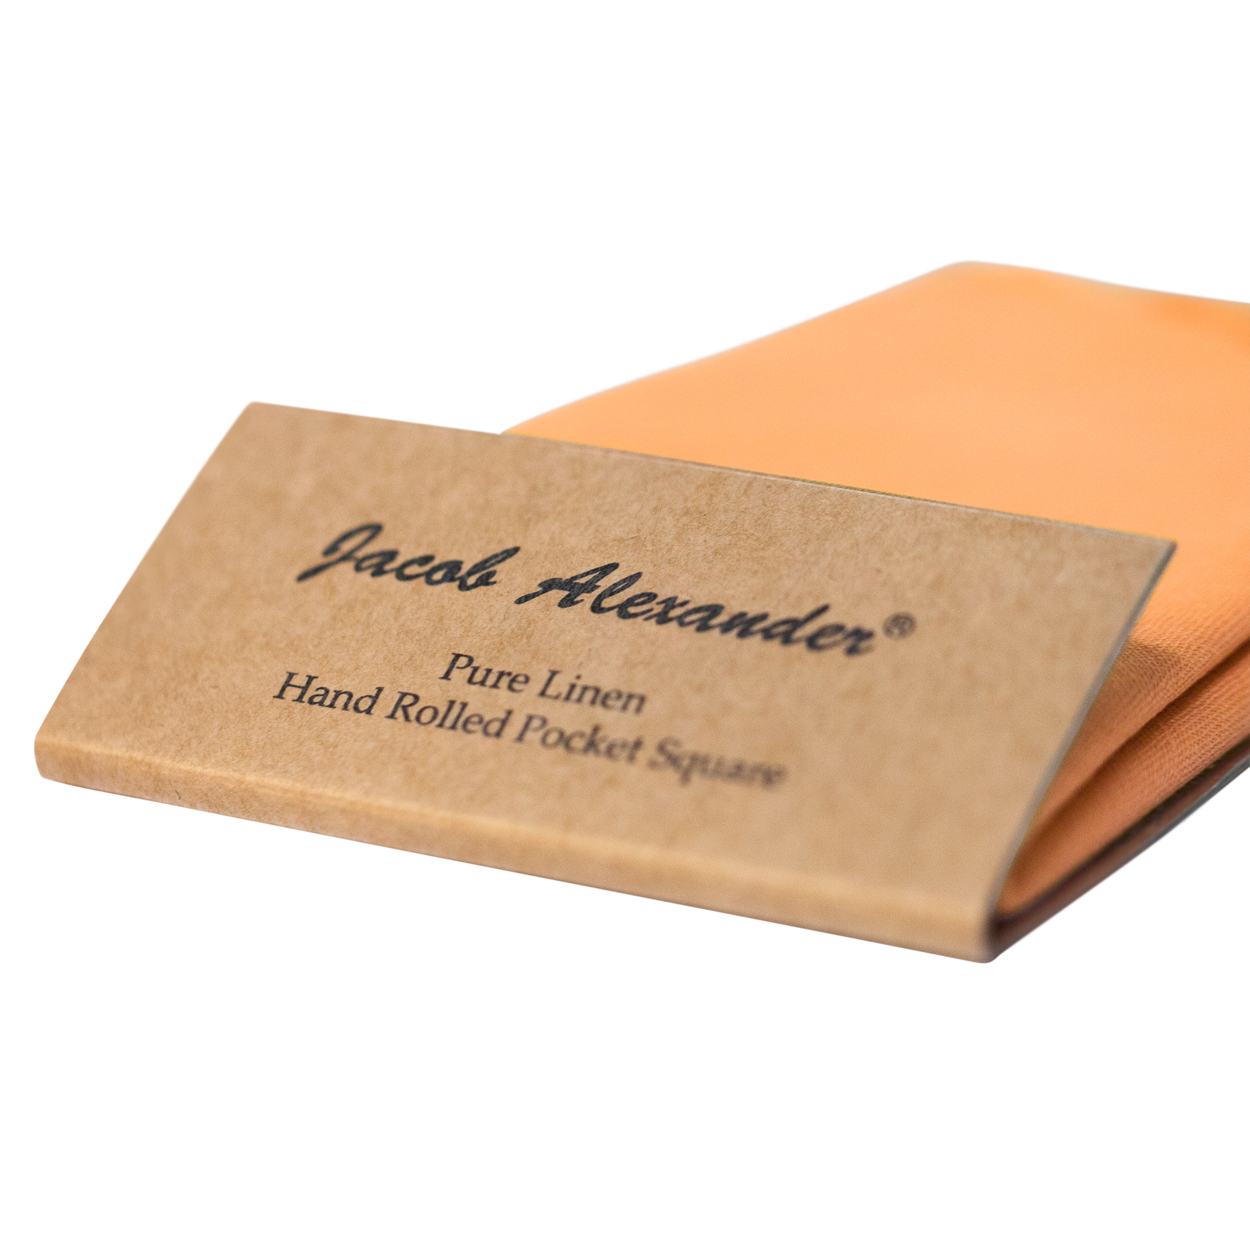 Jacob-Alexander-Linen-Handrolled-15-034-x-15-034-Pocket-Square-Hanky thumbnail 24